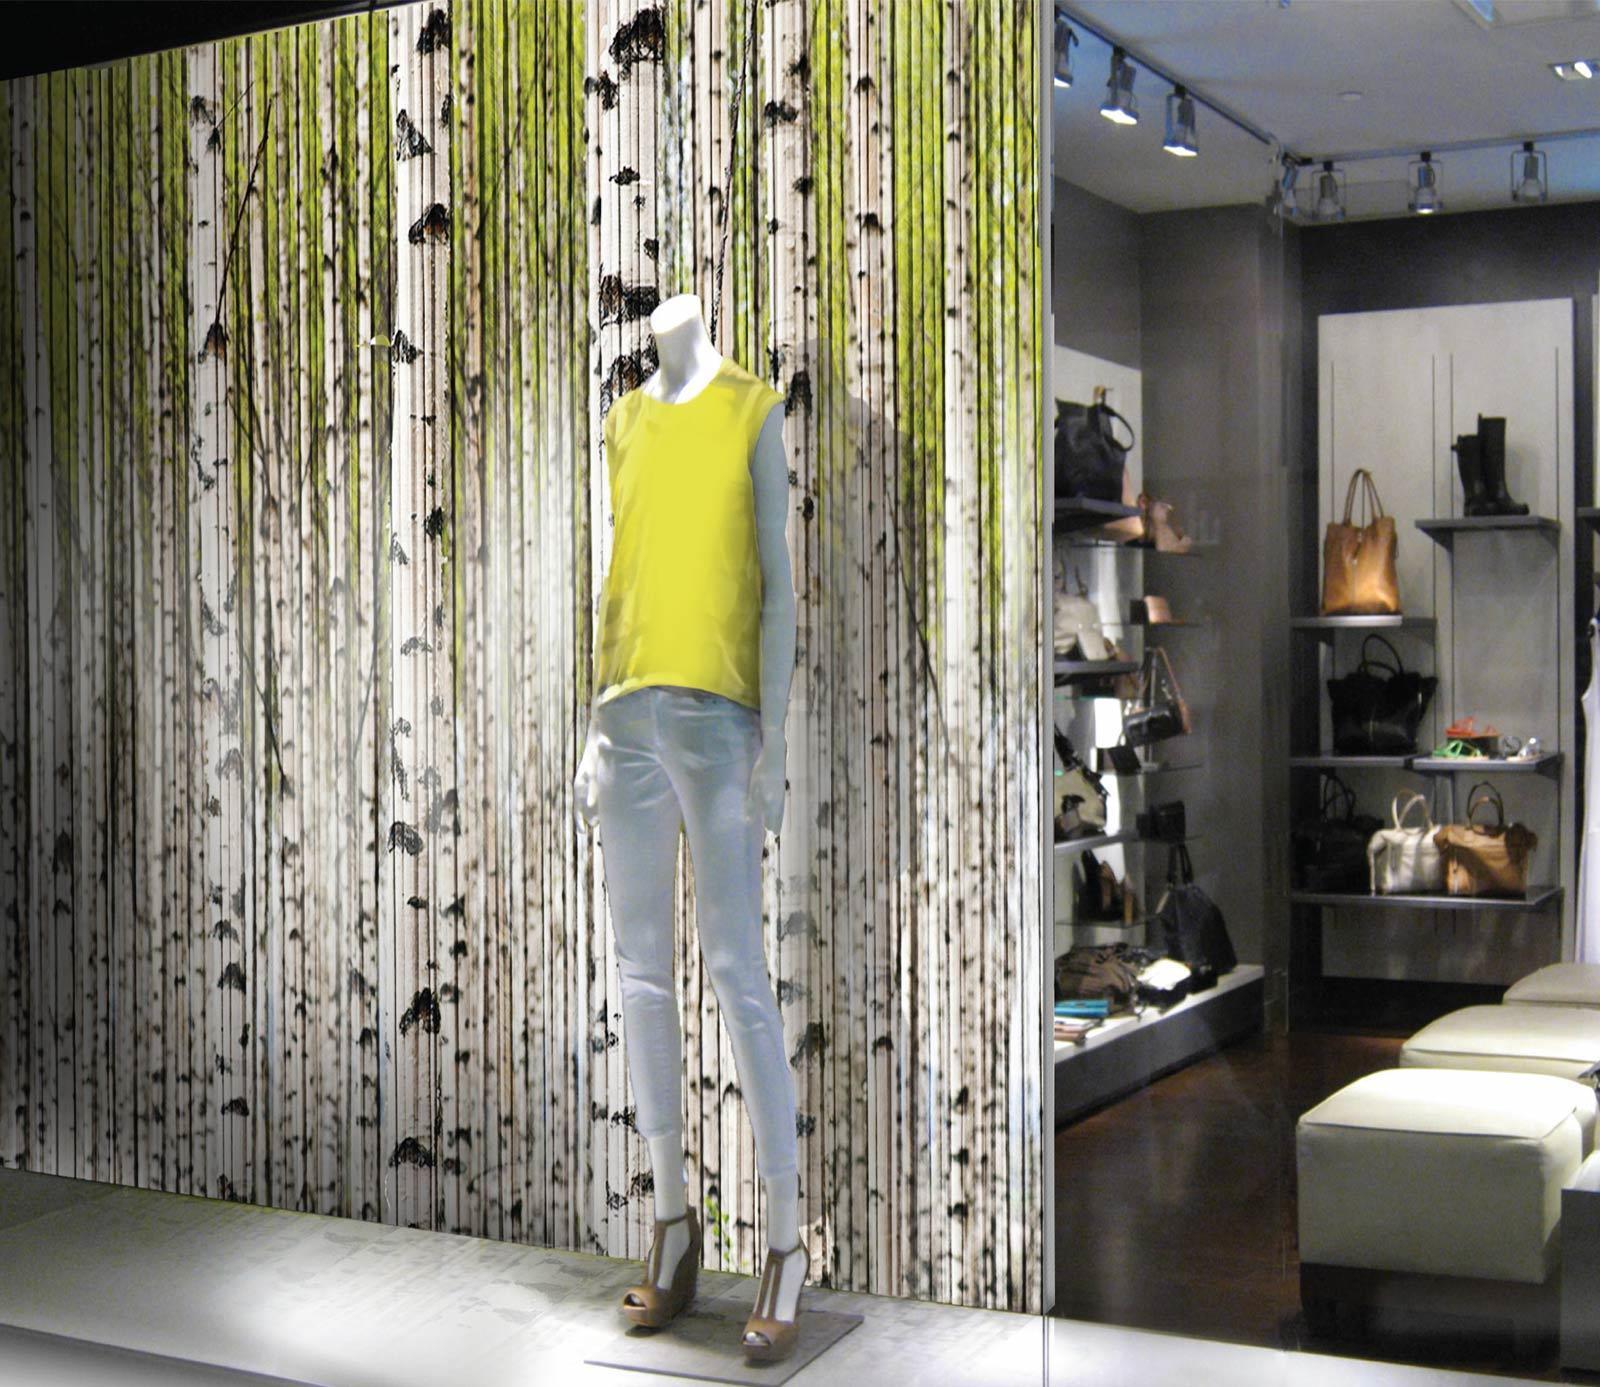 Mz Lookbook Retail Moz Designs Decorative Metal And